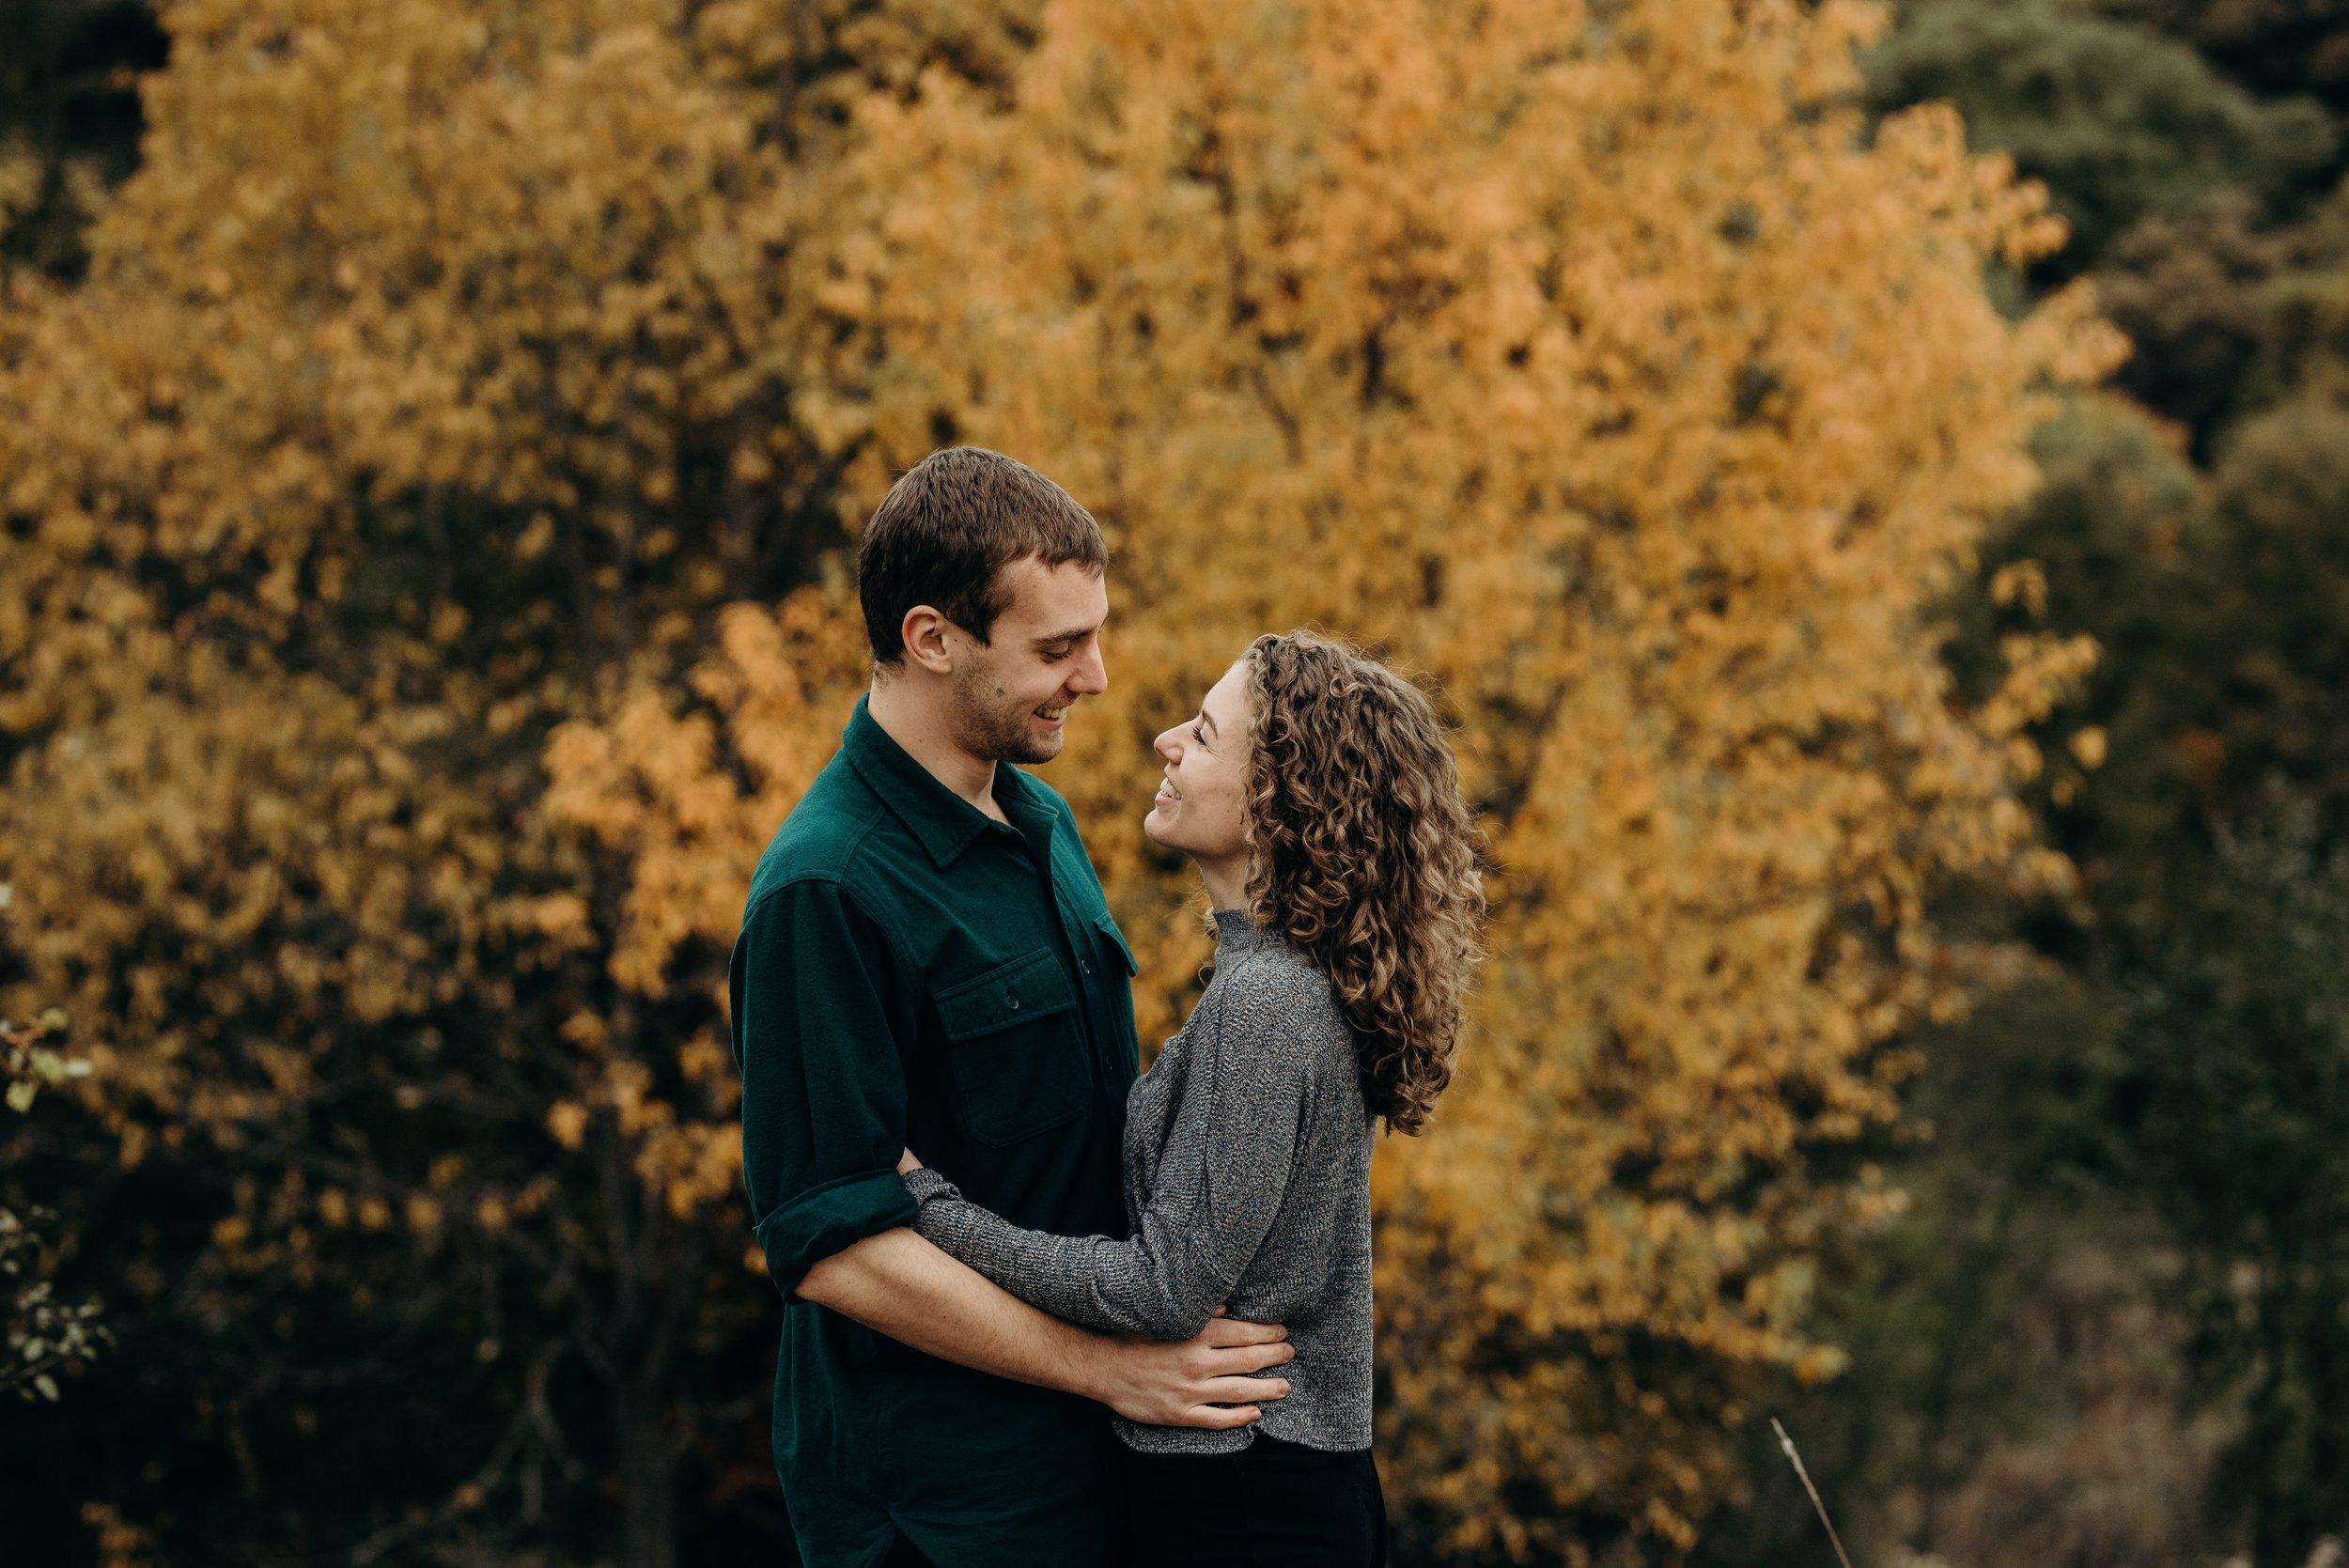 nickmezaphotography-austin-minneapolis-wedding-photographer-elopement-best-intimate-adventurous-destination-texas-minnesota-engagement-jess-dan-spacesaver_0205.jpg